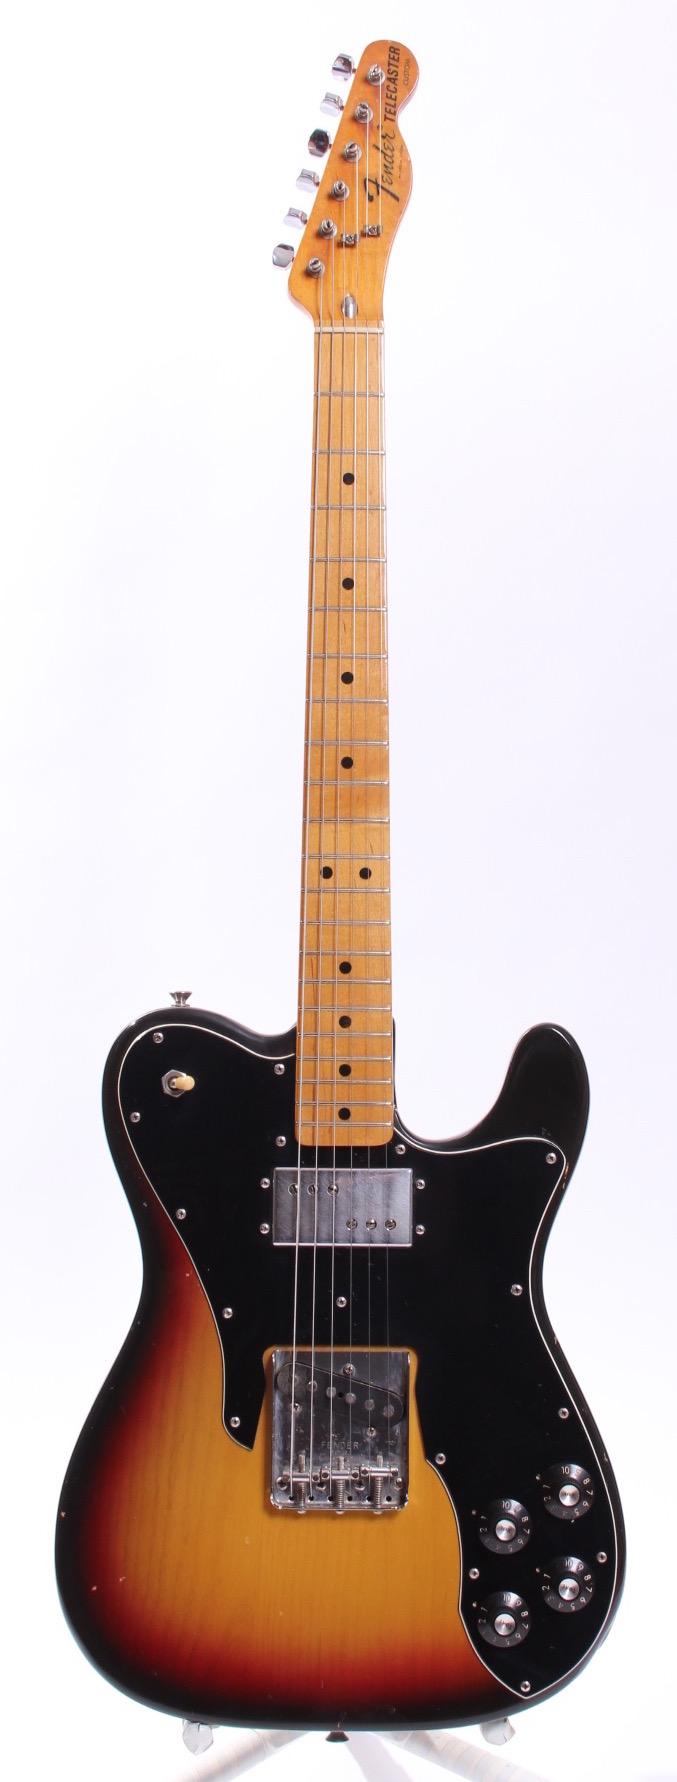 fender telecaster custom 1974 sunburst guitar for sale yeahman 39 s guitars. Black Bedroom Furniture Sets. Home Design Ideas